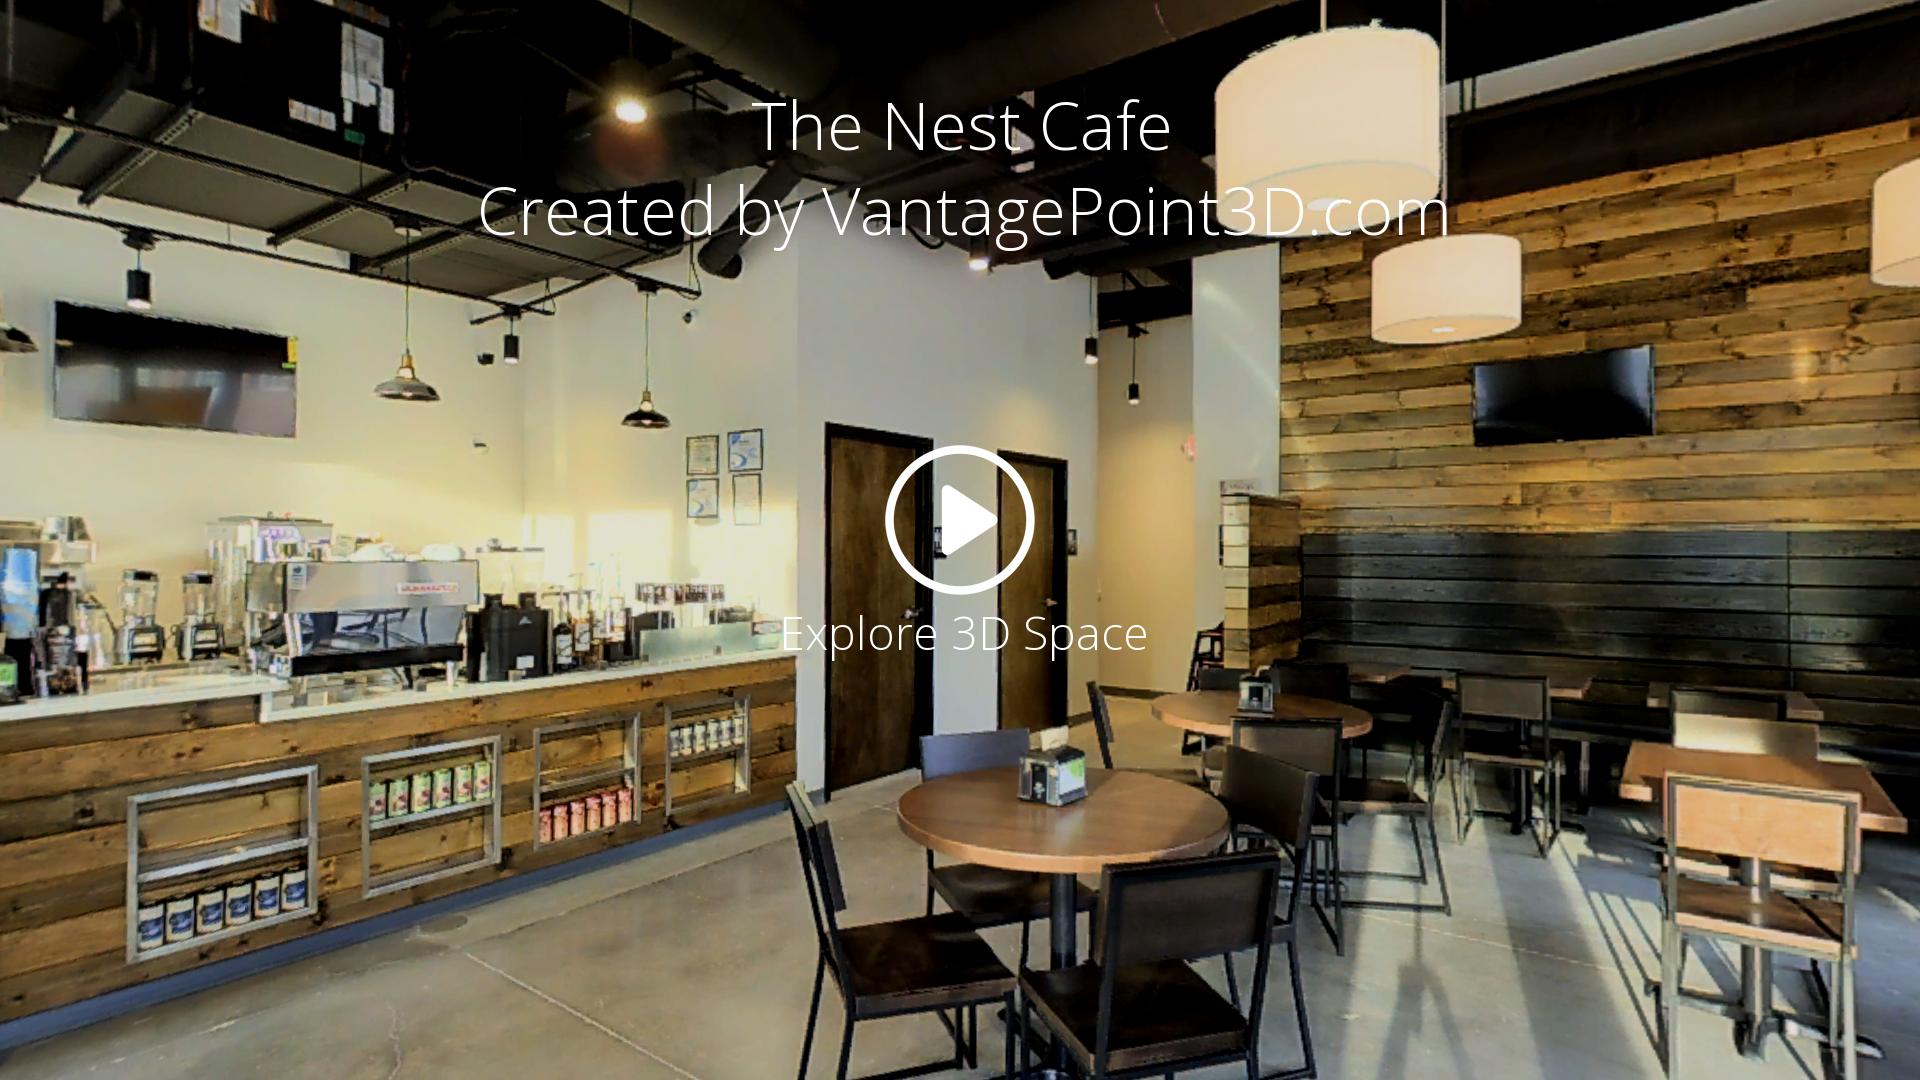 The Nest Cafe — VantagePoint 3D